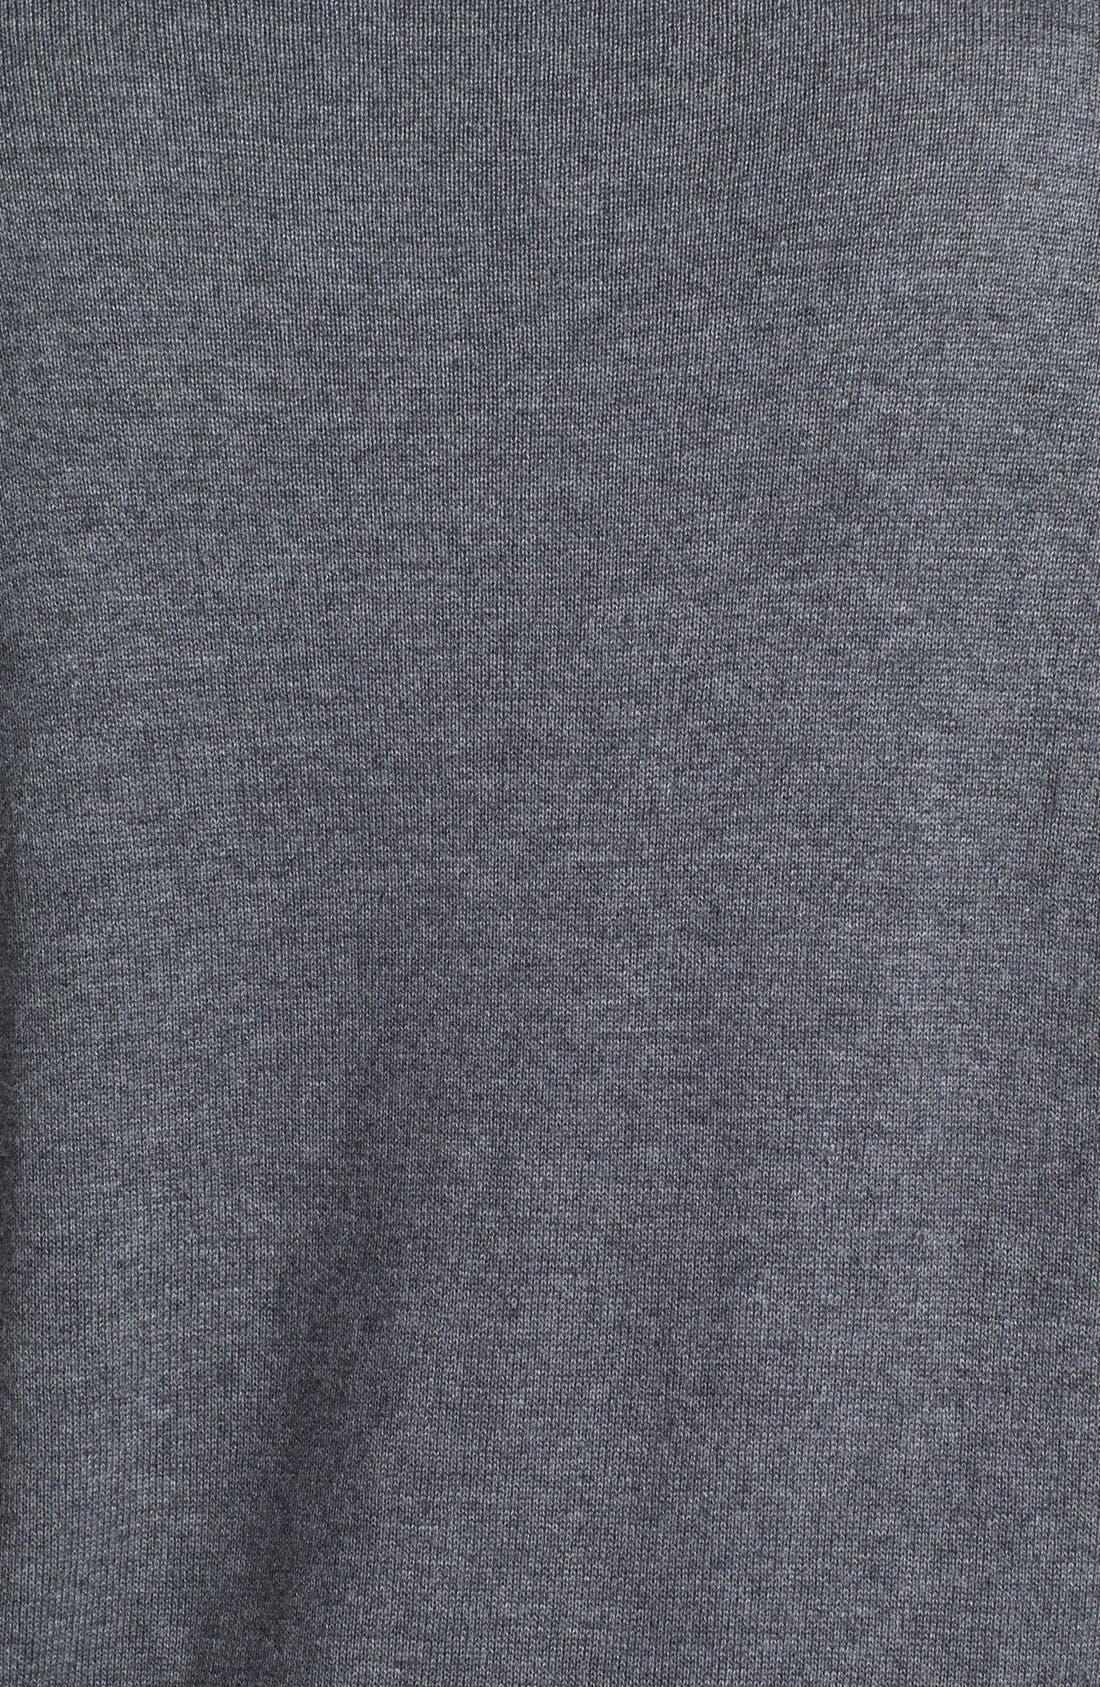 Intarsia Crewneck Sweater,                             Alternate thumbnail 8, color,